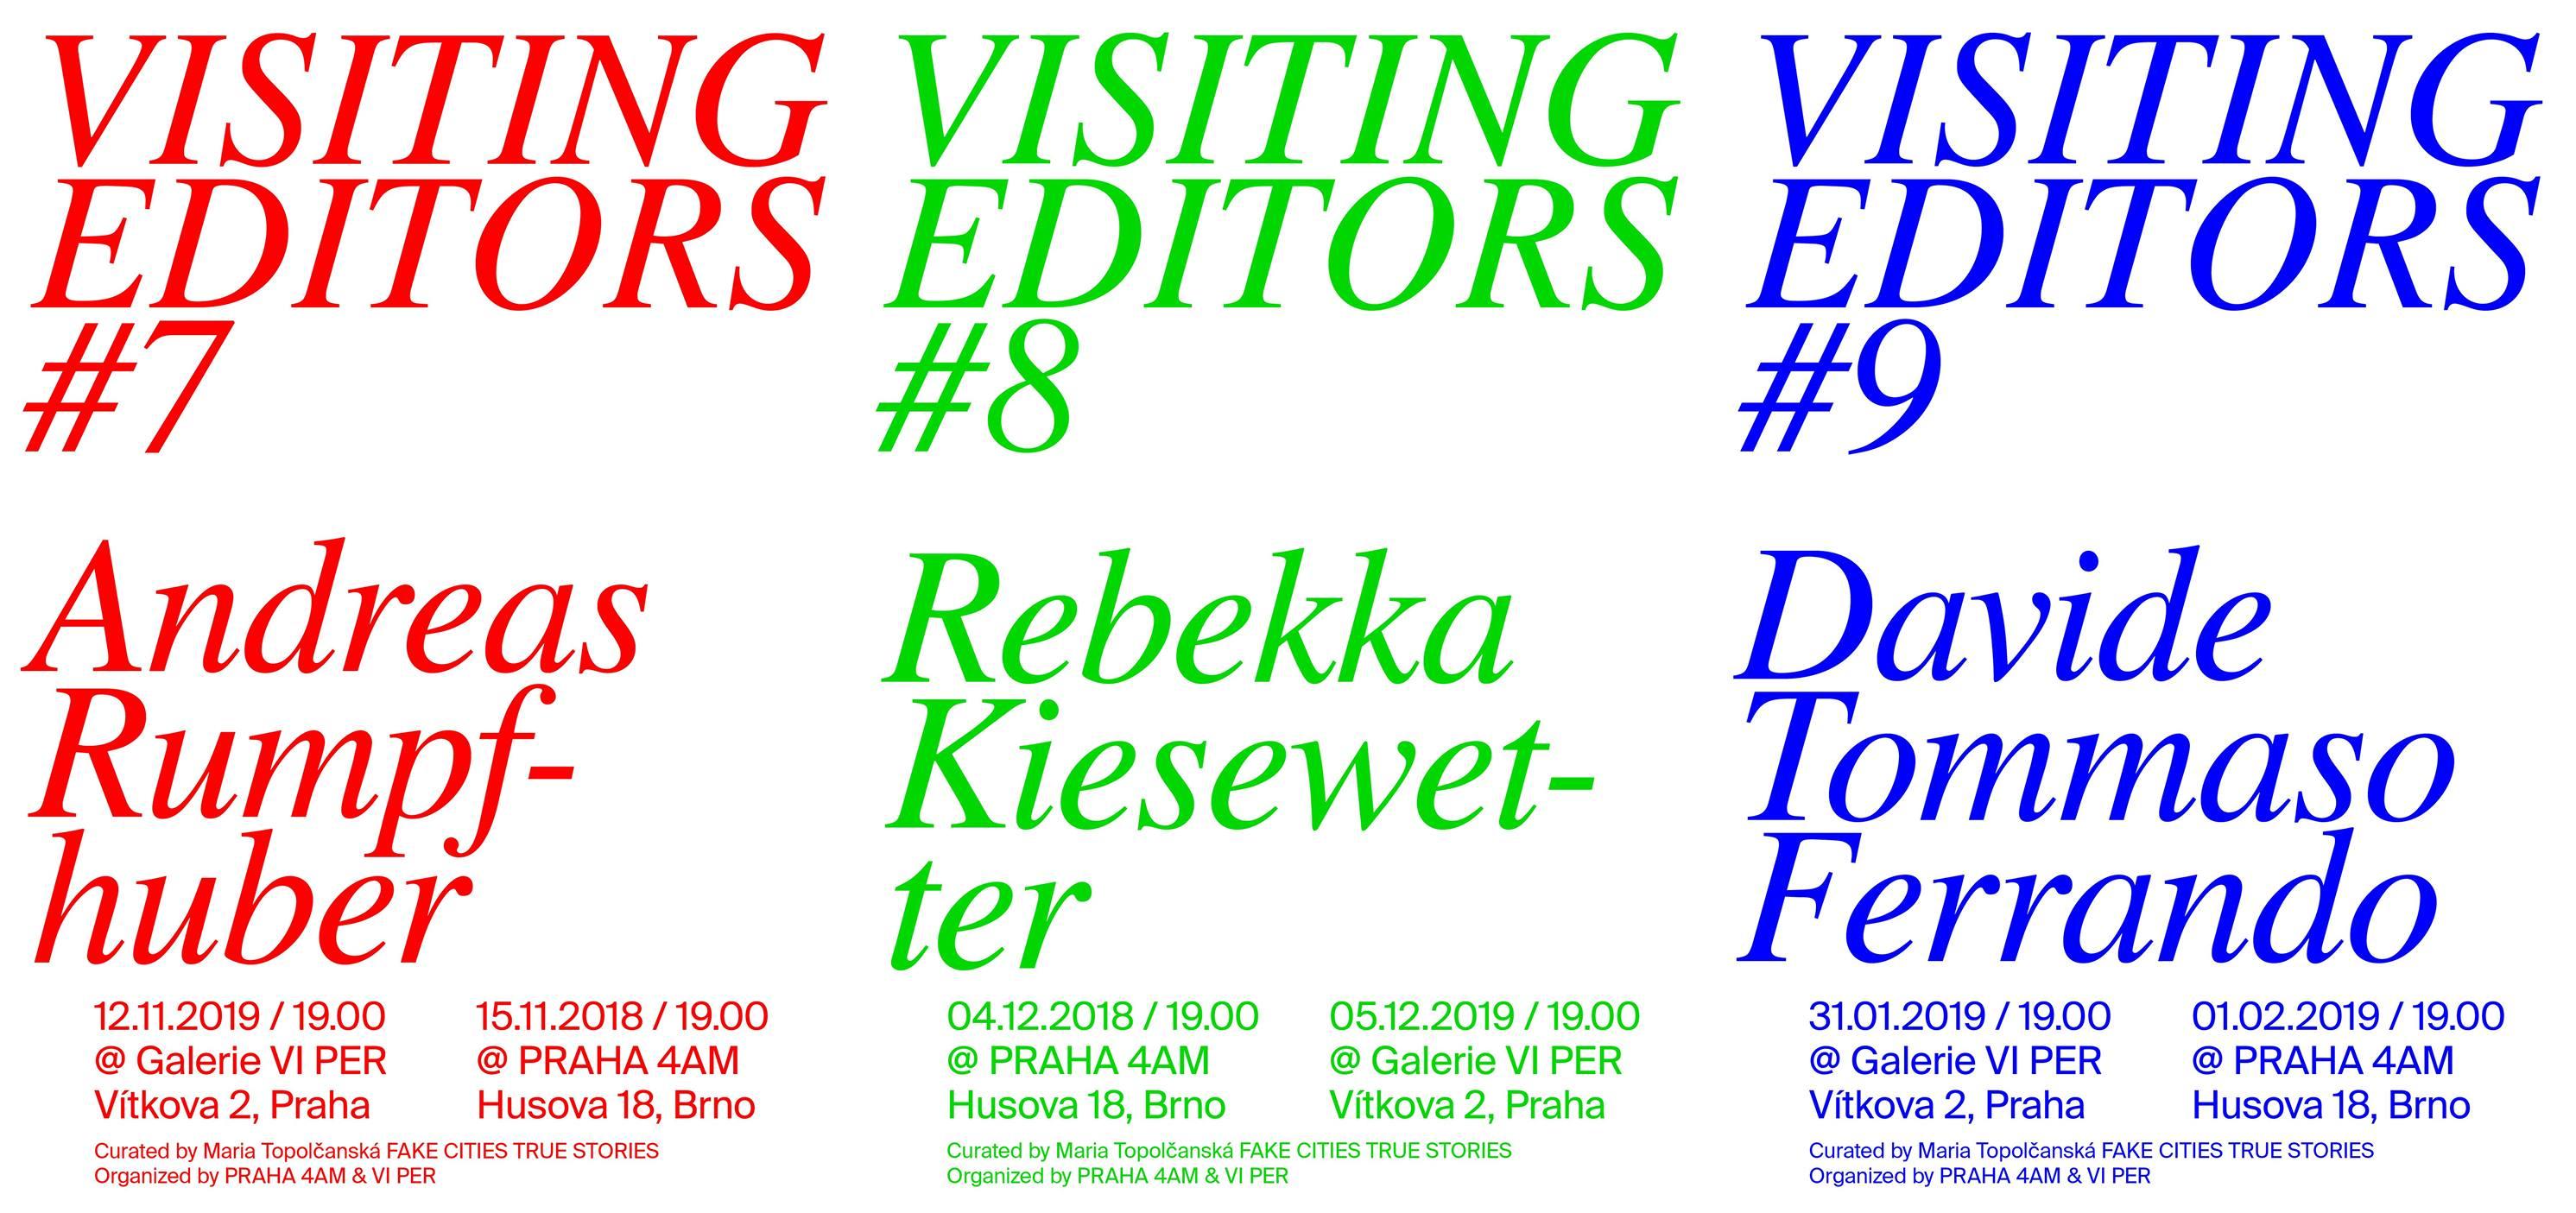 ÚT / 4.12. / 19.00 / VISITING EDITORS #8 Rebekka Kiesewetter: Publishing as Critical Device / přednáška, diskuse